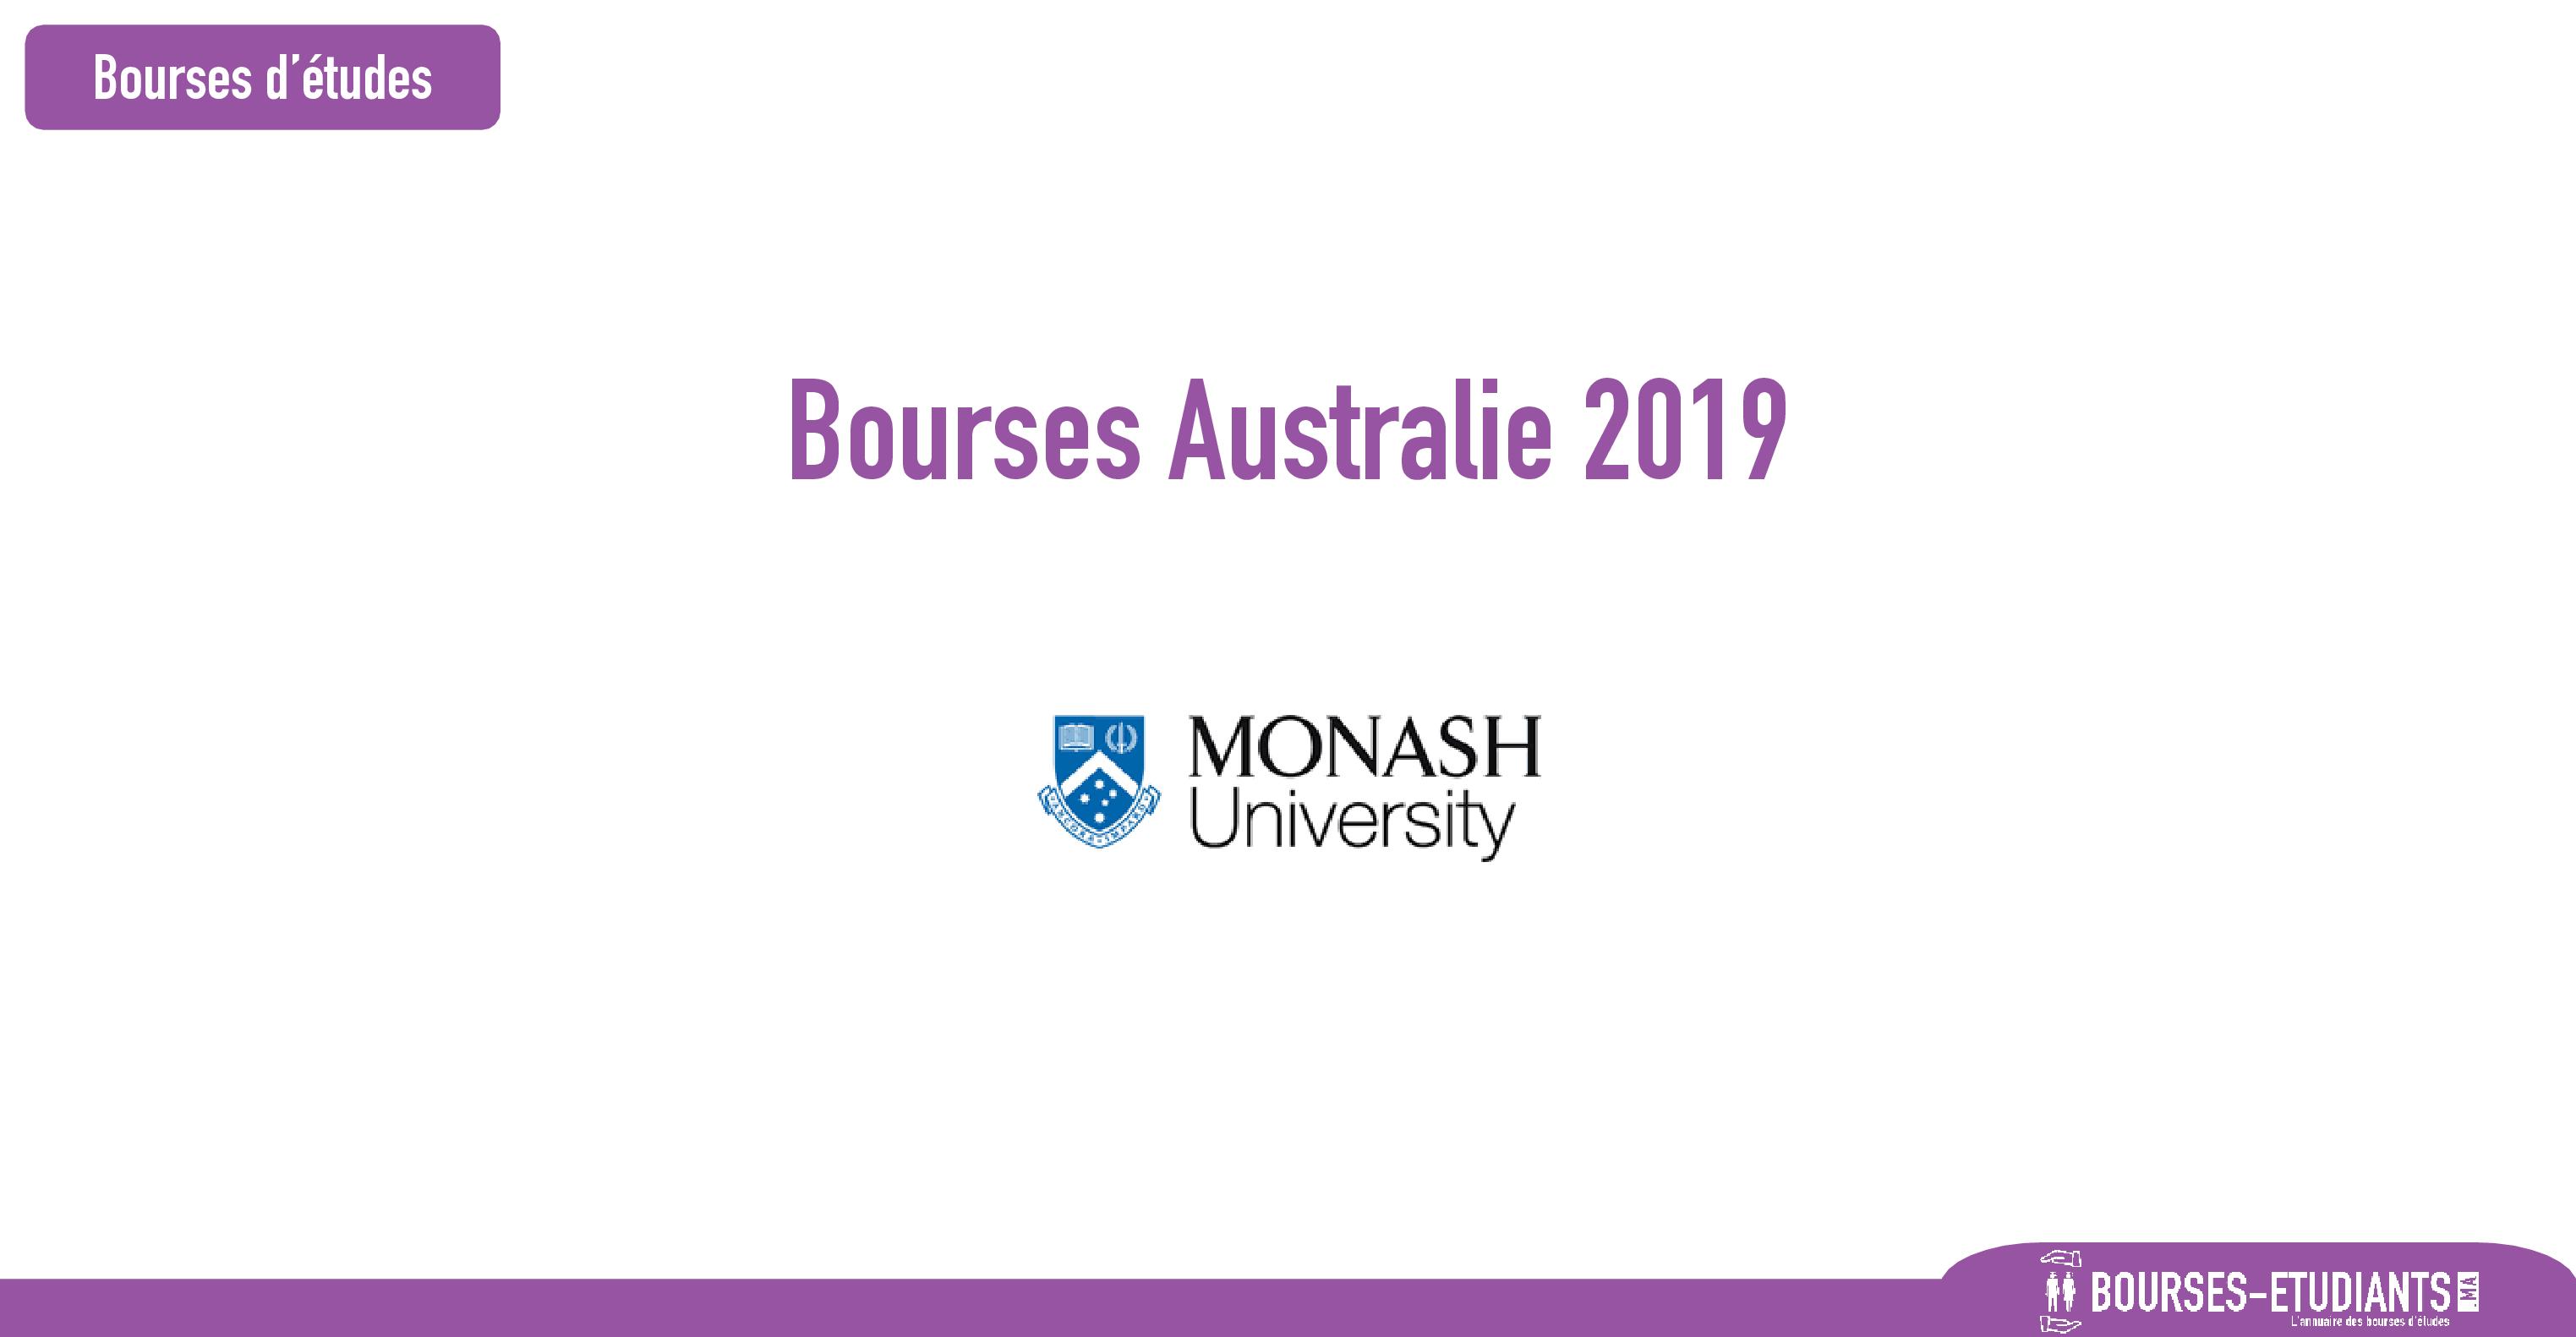 bourse Monash University